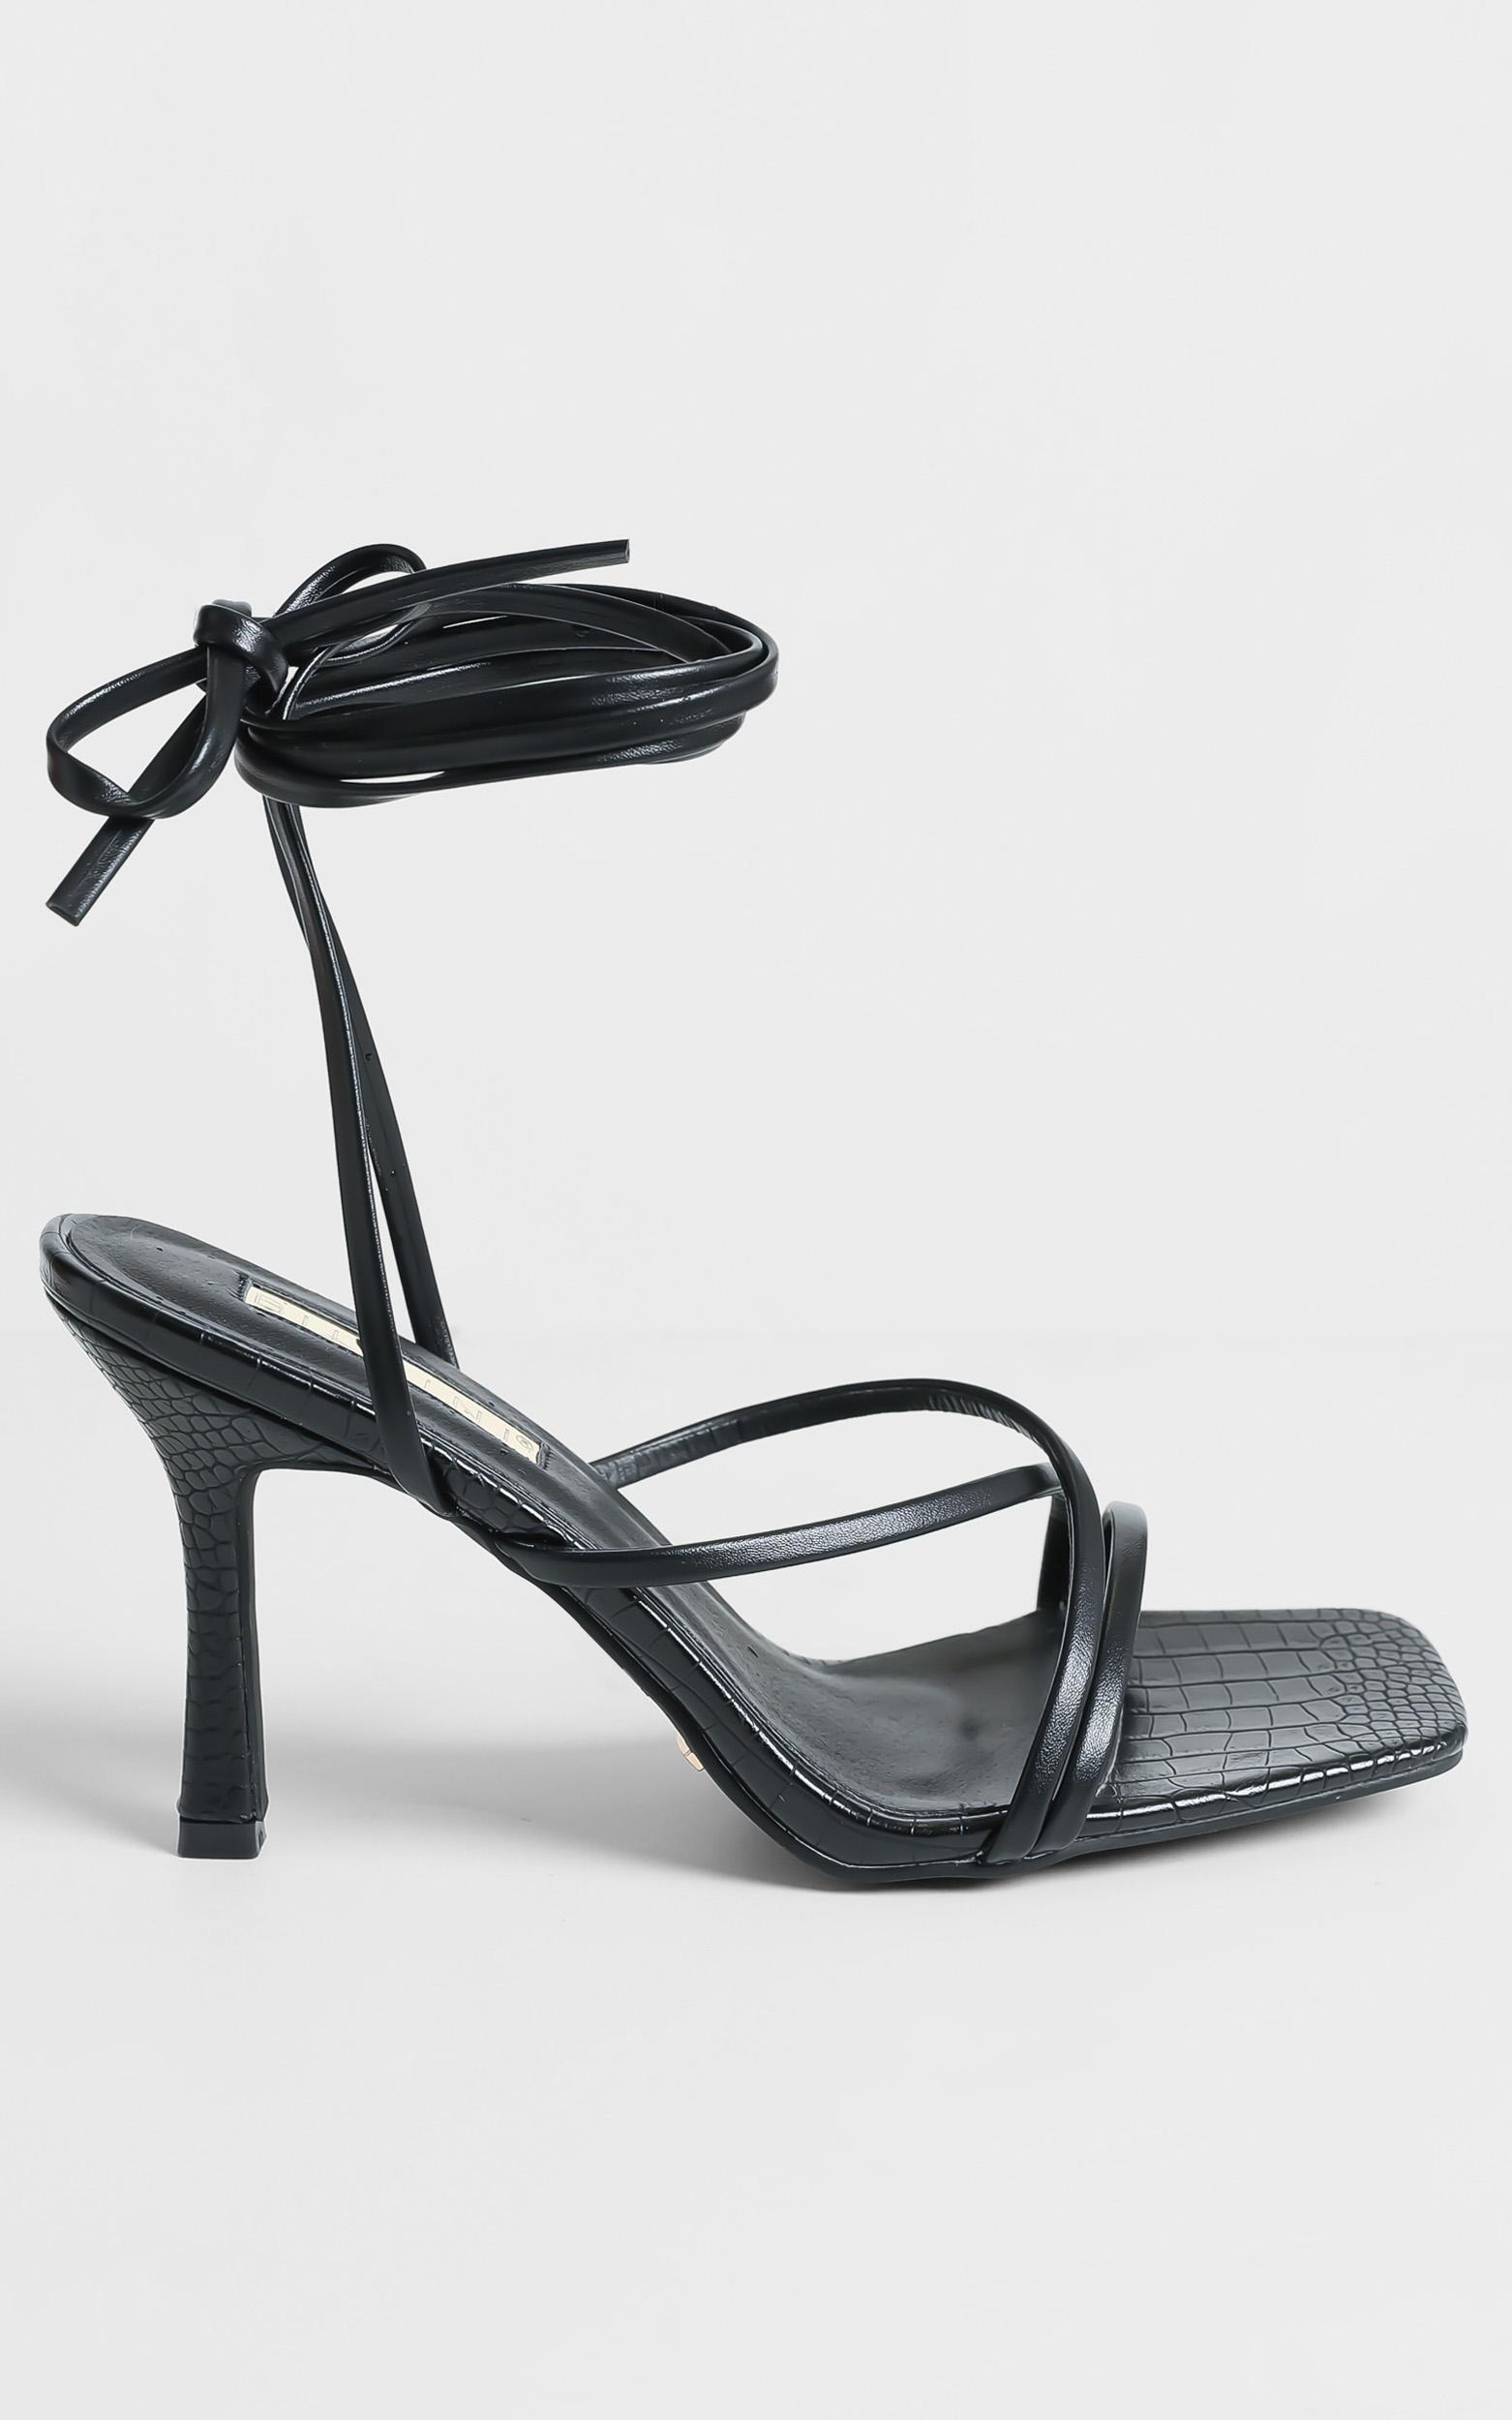 Billini - Summer Heels in Black - 05, BLK1, hi-res image number null